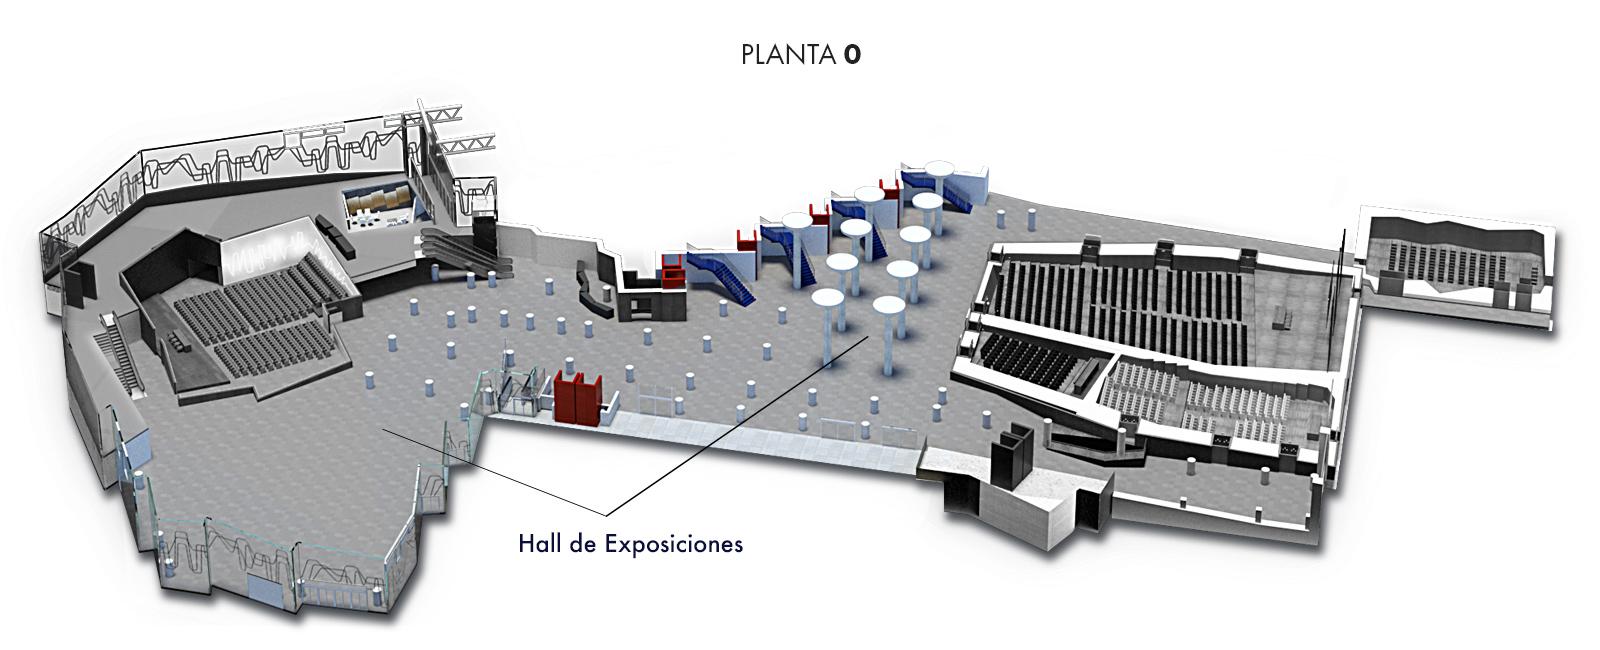 Hall de Exposiciones, Planta 0   Palacio Euskalduna Jauregia